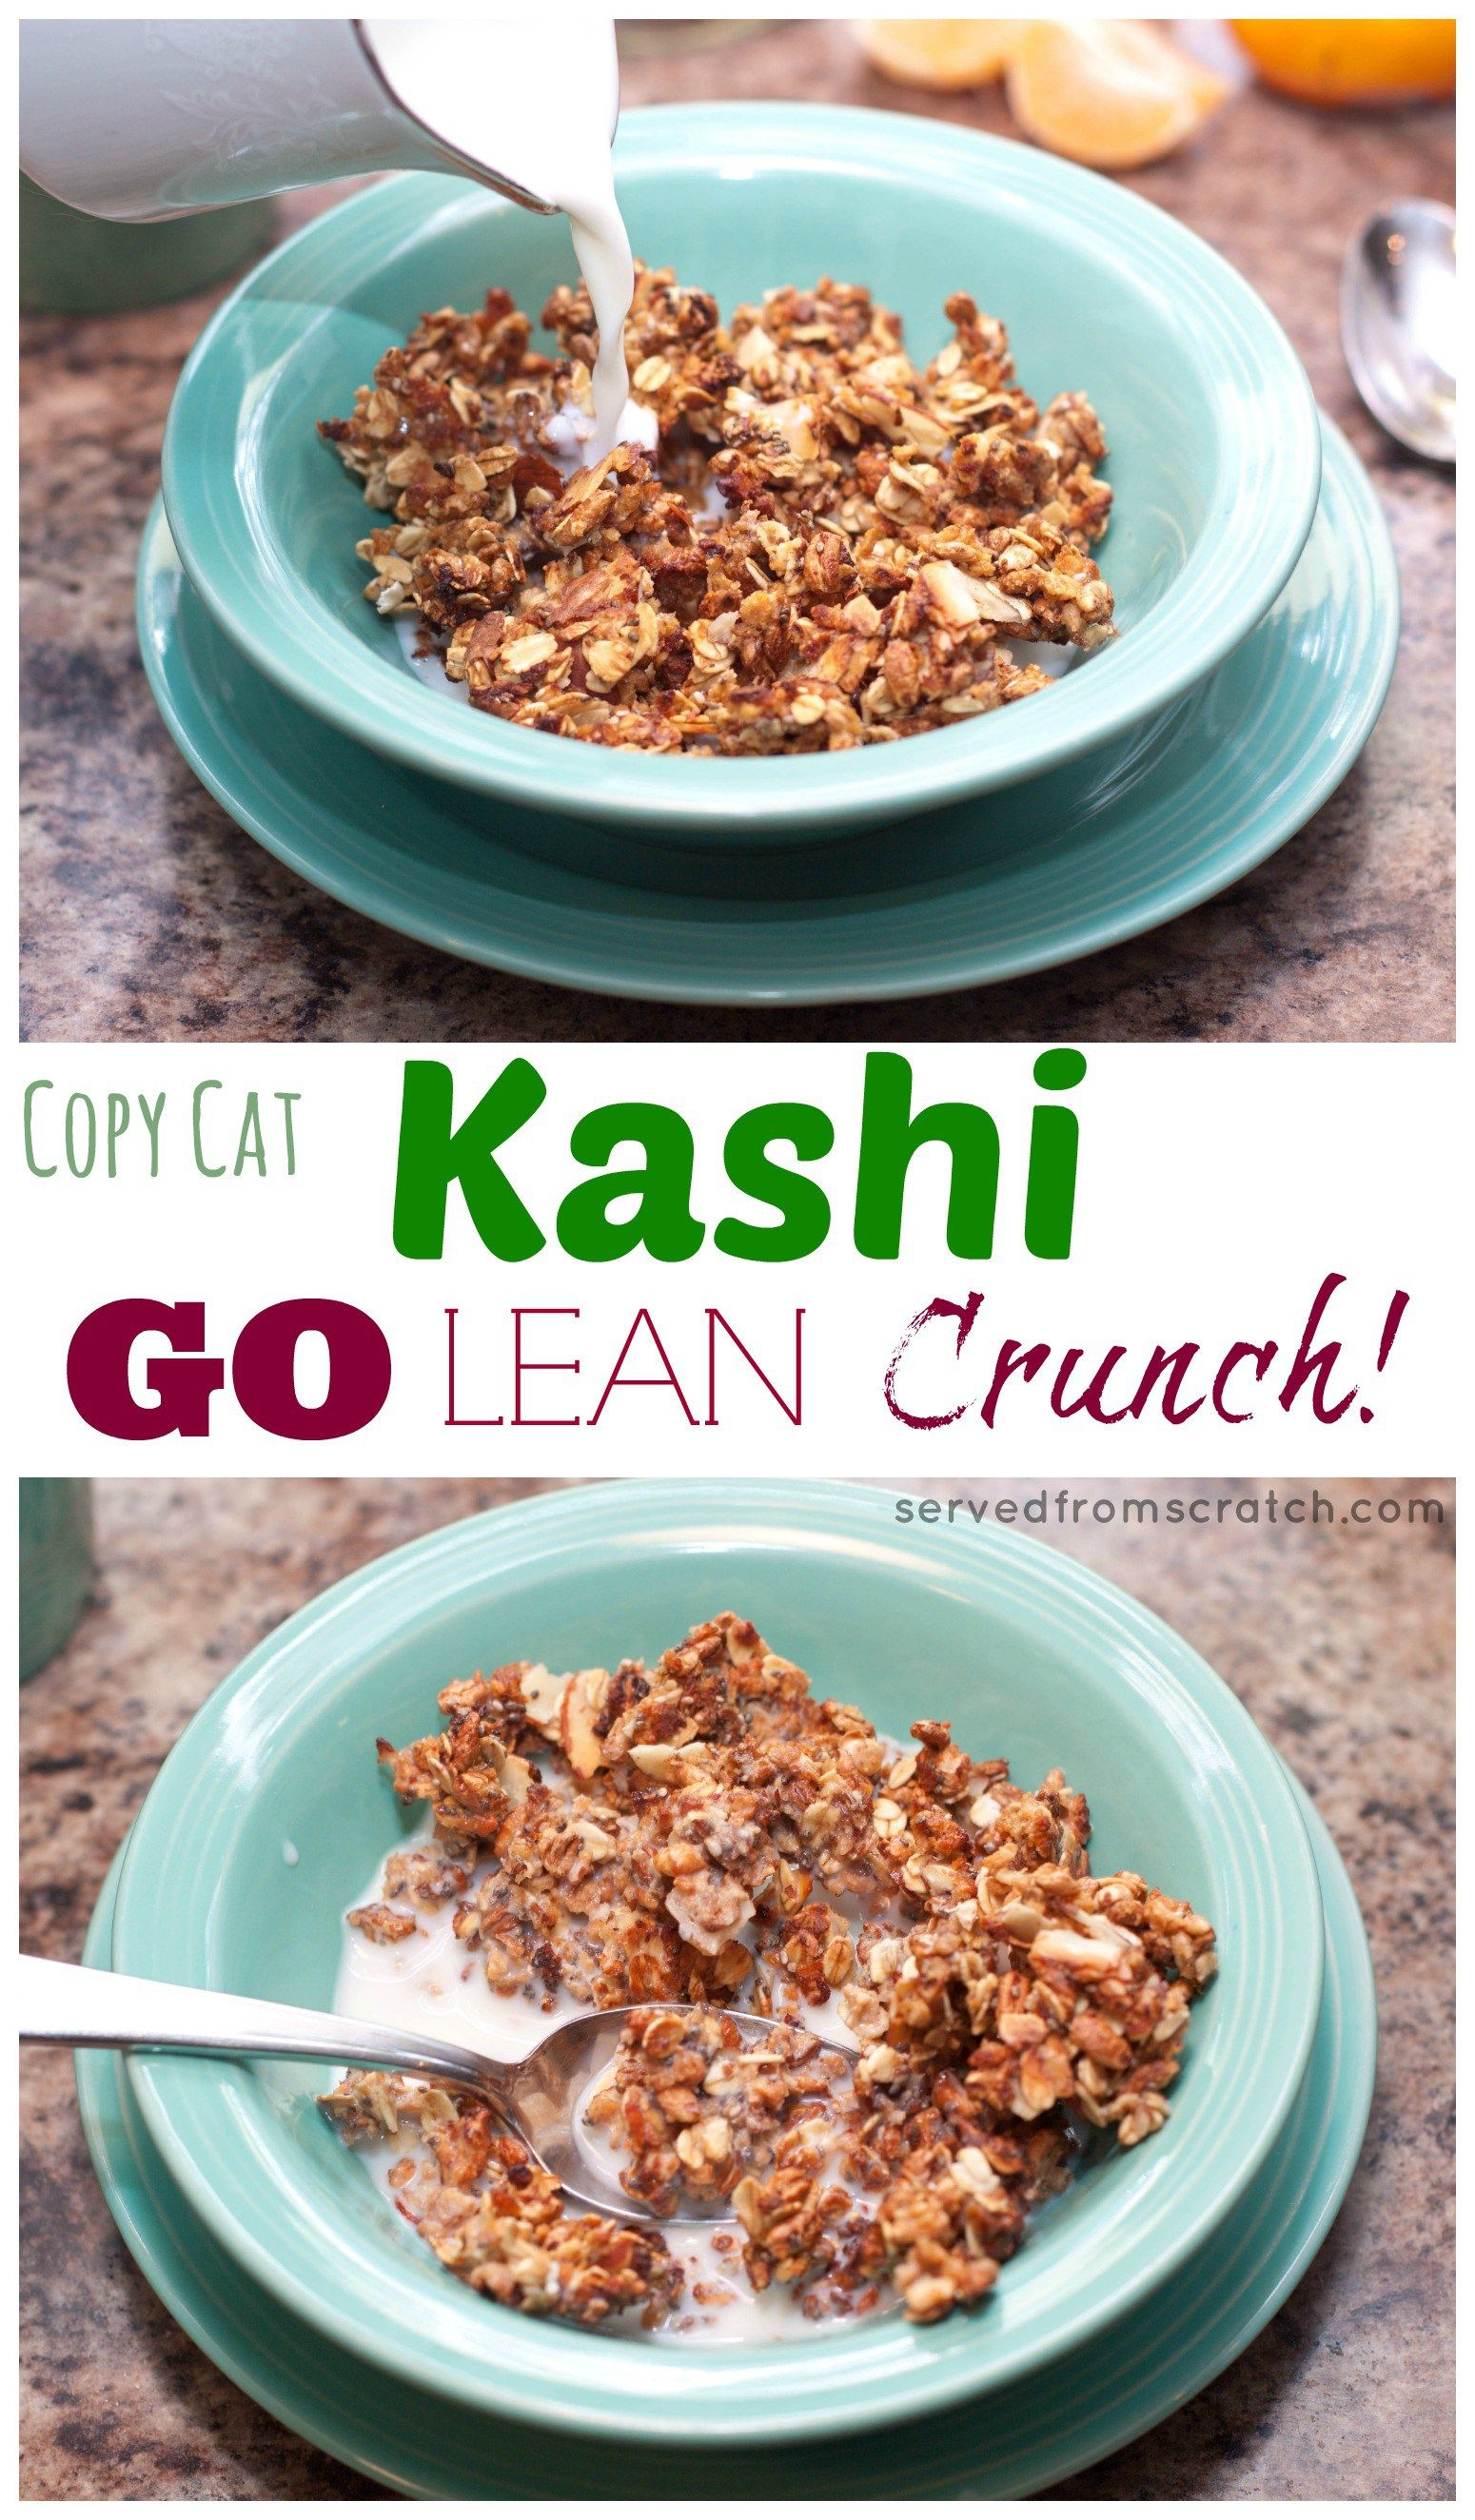 Copycat kashi go lean crunch cereal recipe healthy cereal copycat kashi go lean crunch cereal ccuart Choice Image